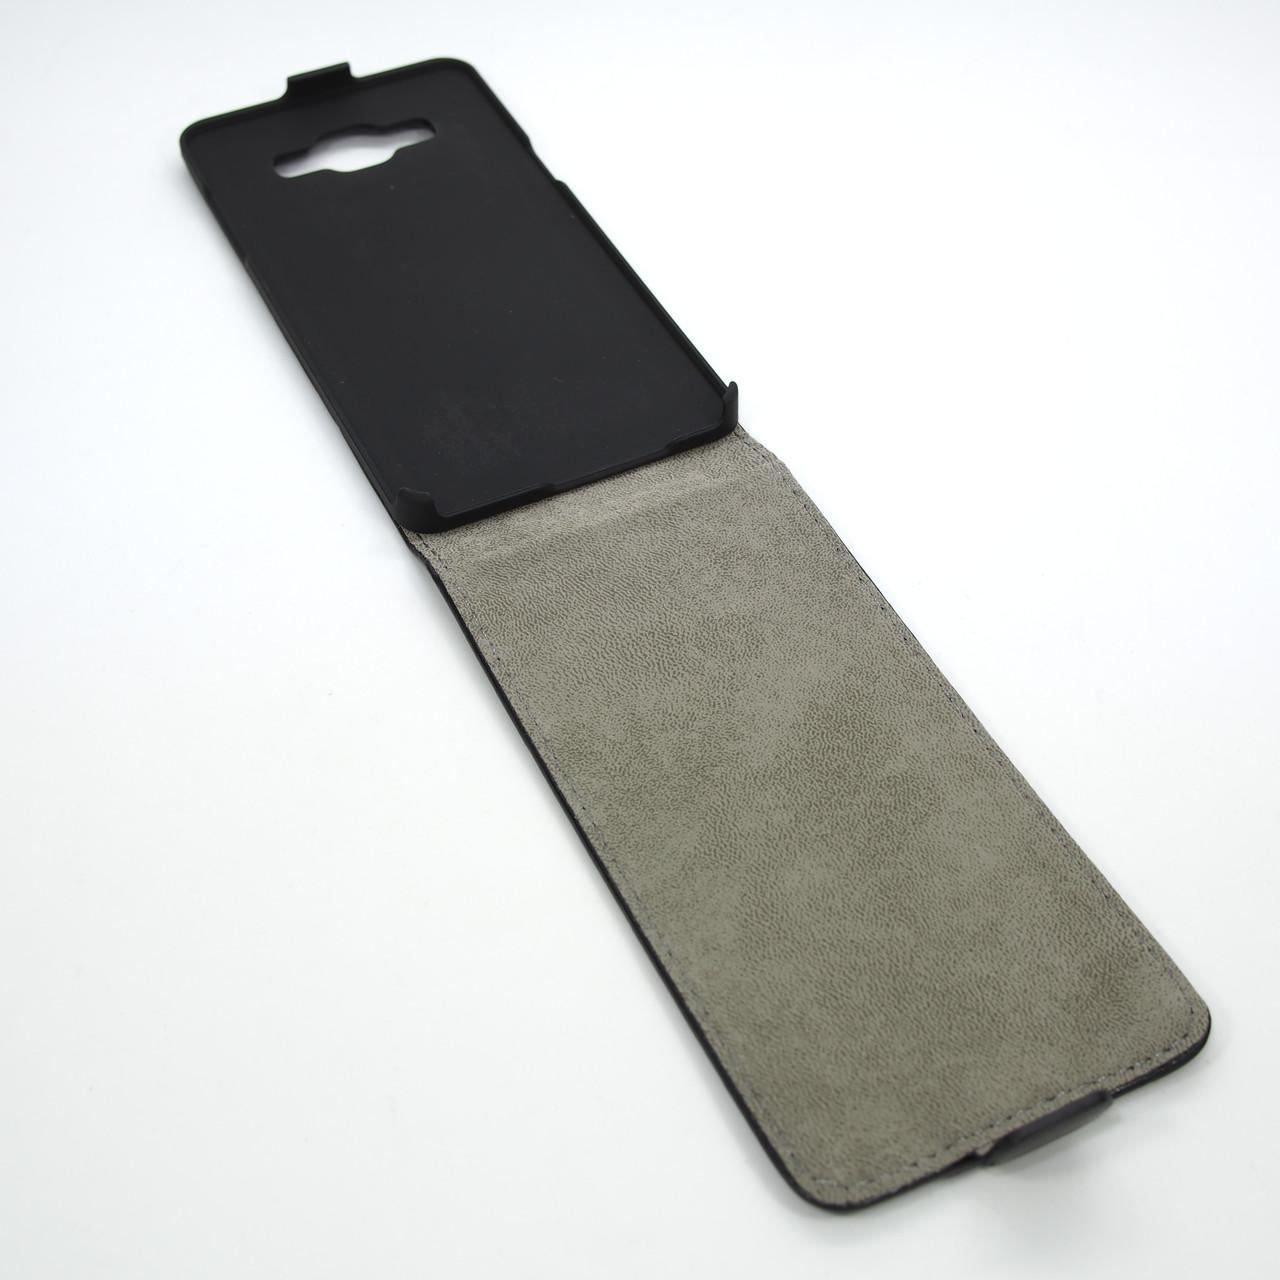 Samsung A5 A500 black